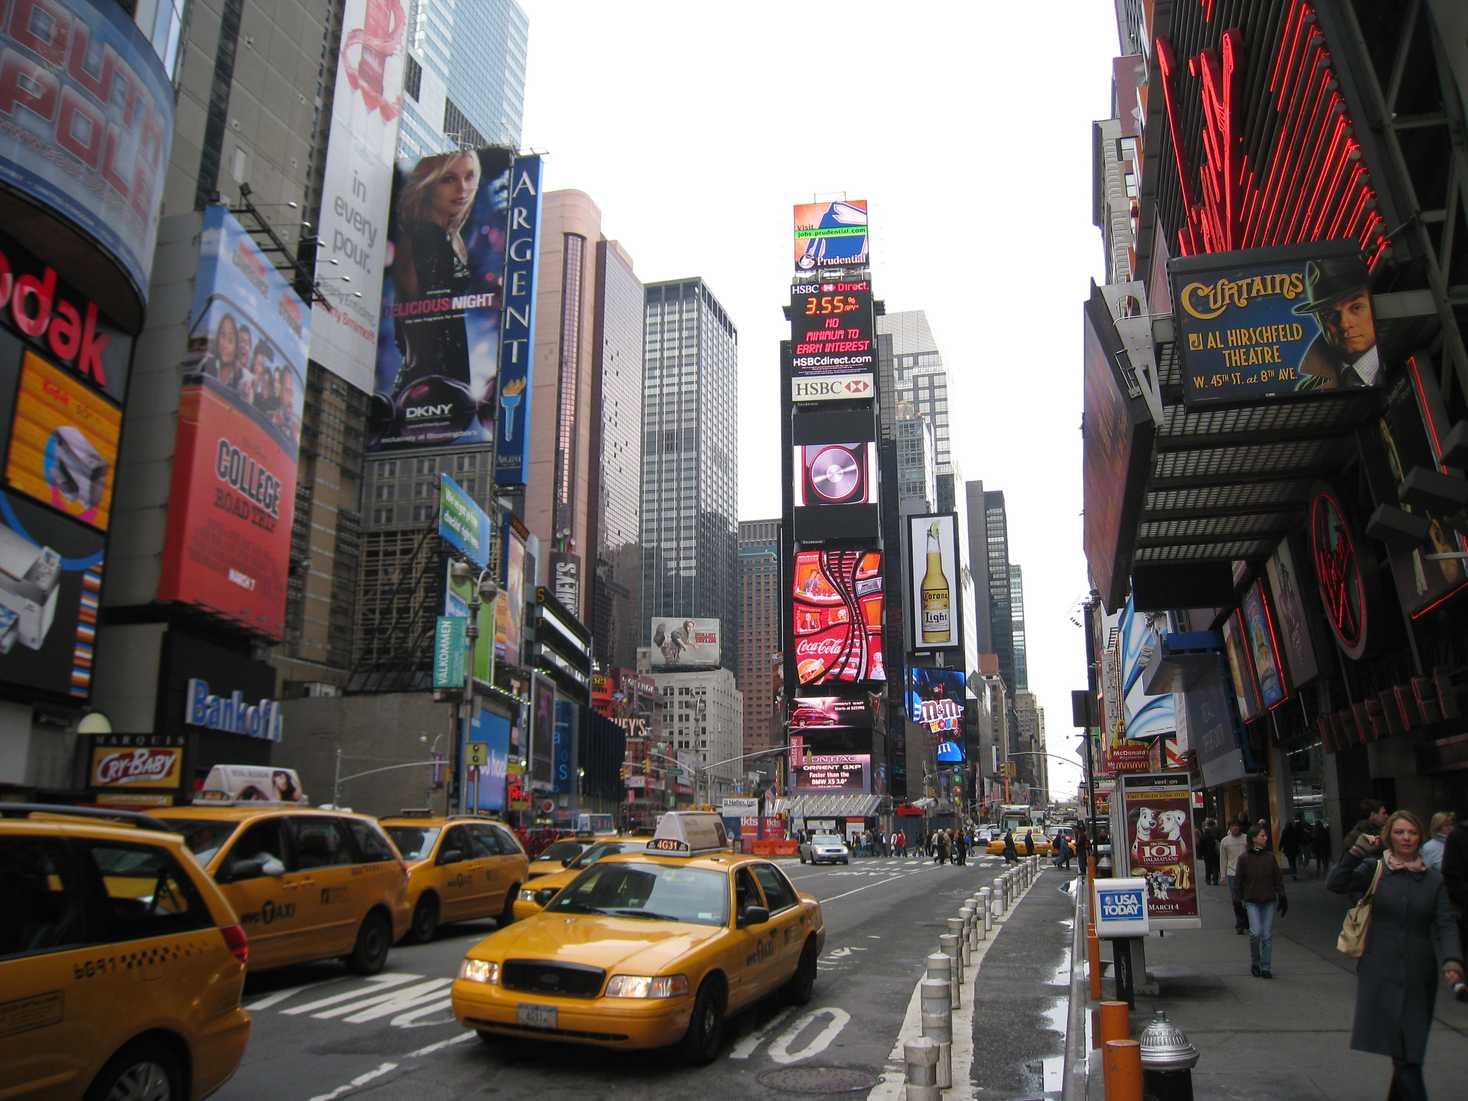 http://3.bp.blogspot.com/-N9S-fDg4rrc/TxXyB3aQSZI/AAAAAAAAA8w/pp_eREZG3zM/s1600/NYC+02.jpg